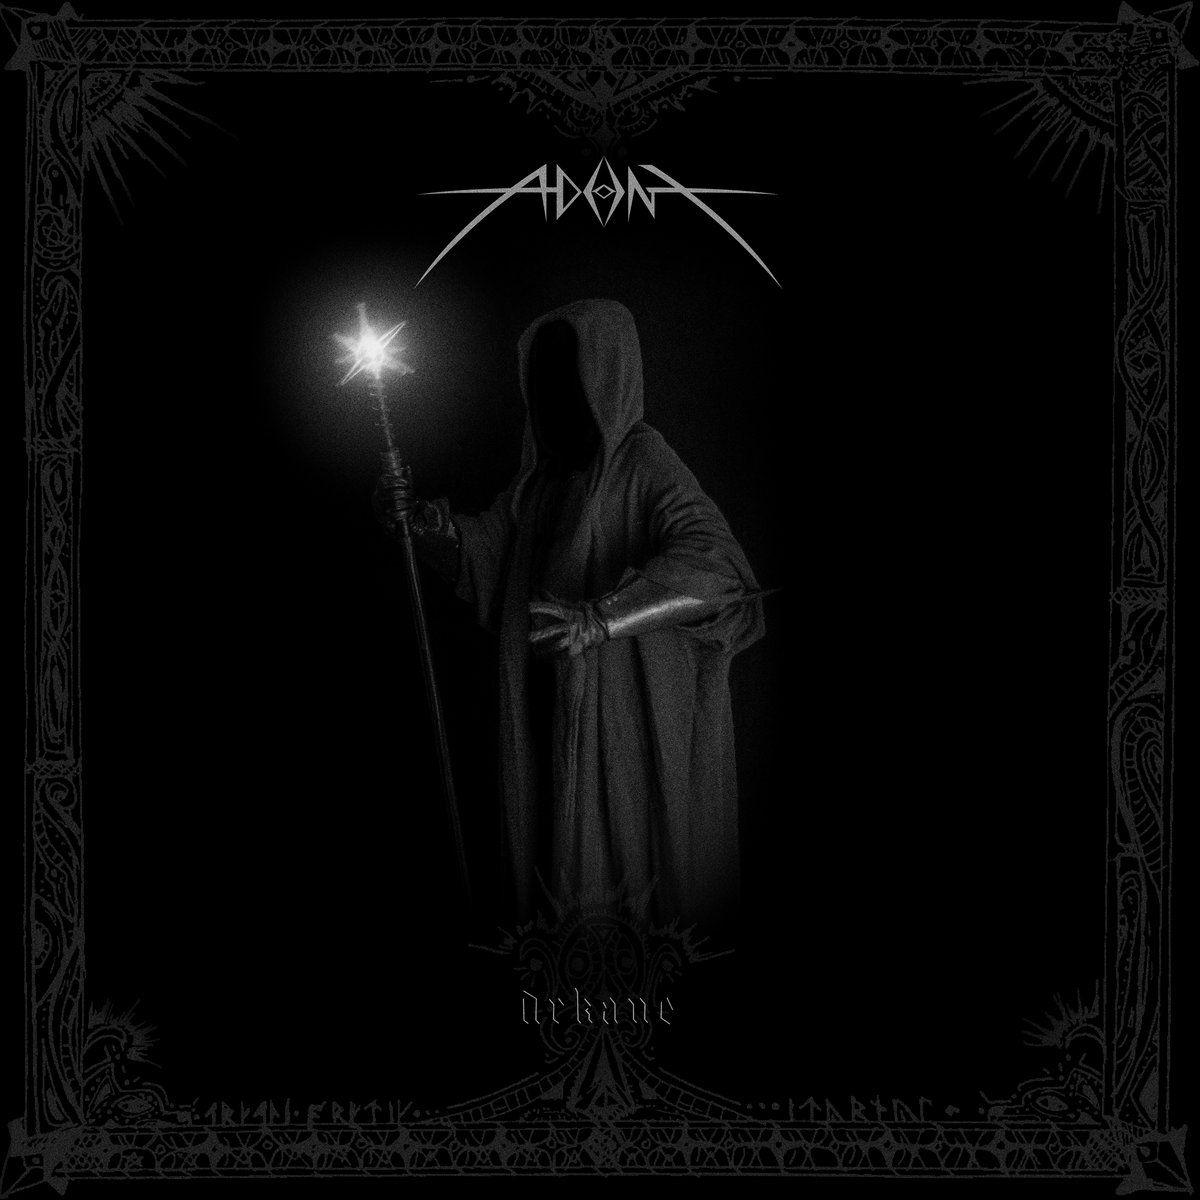 Reviews for Adon - Arkane